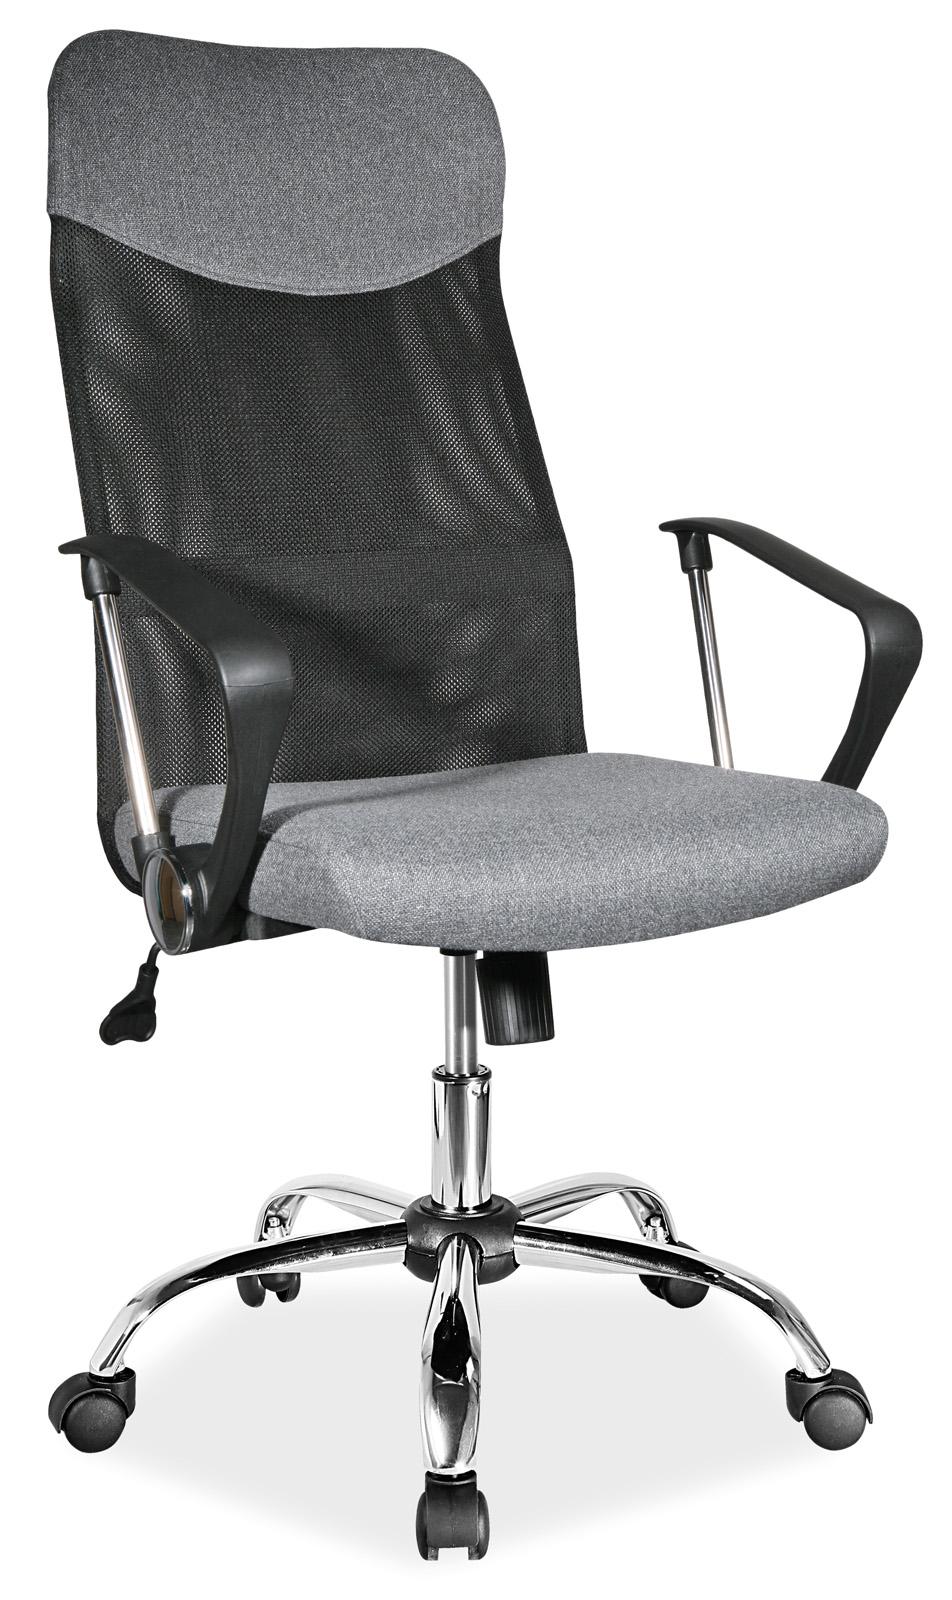 Scaun de birou ergonomic tapitat cu stofa Q-025 Grey, l62xA50xH107-116 cm vivre.ro